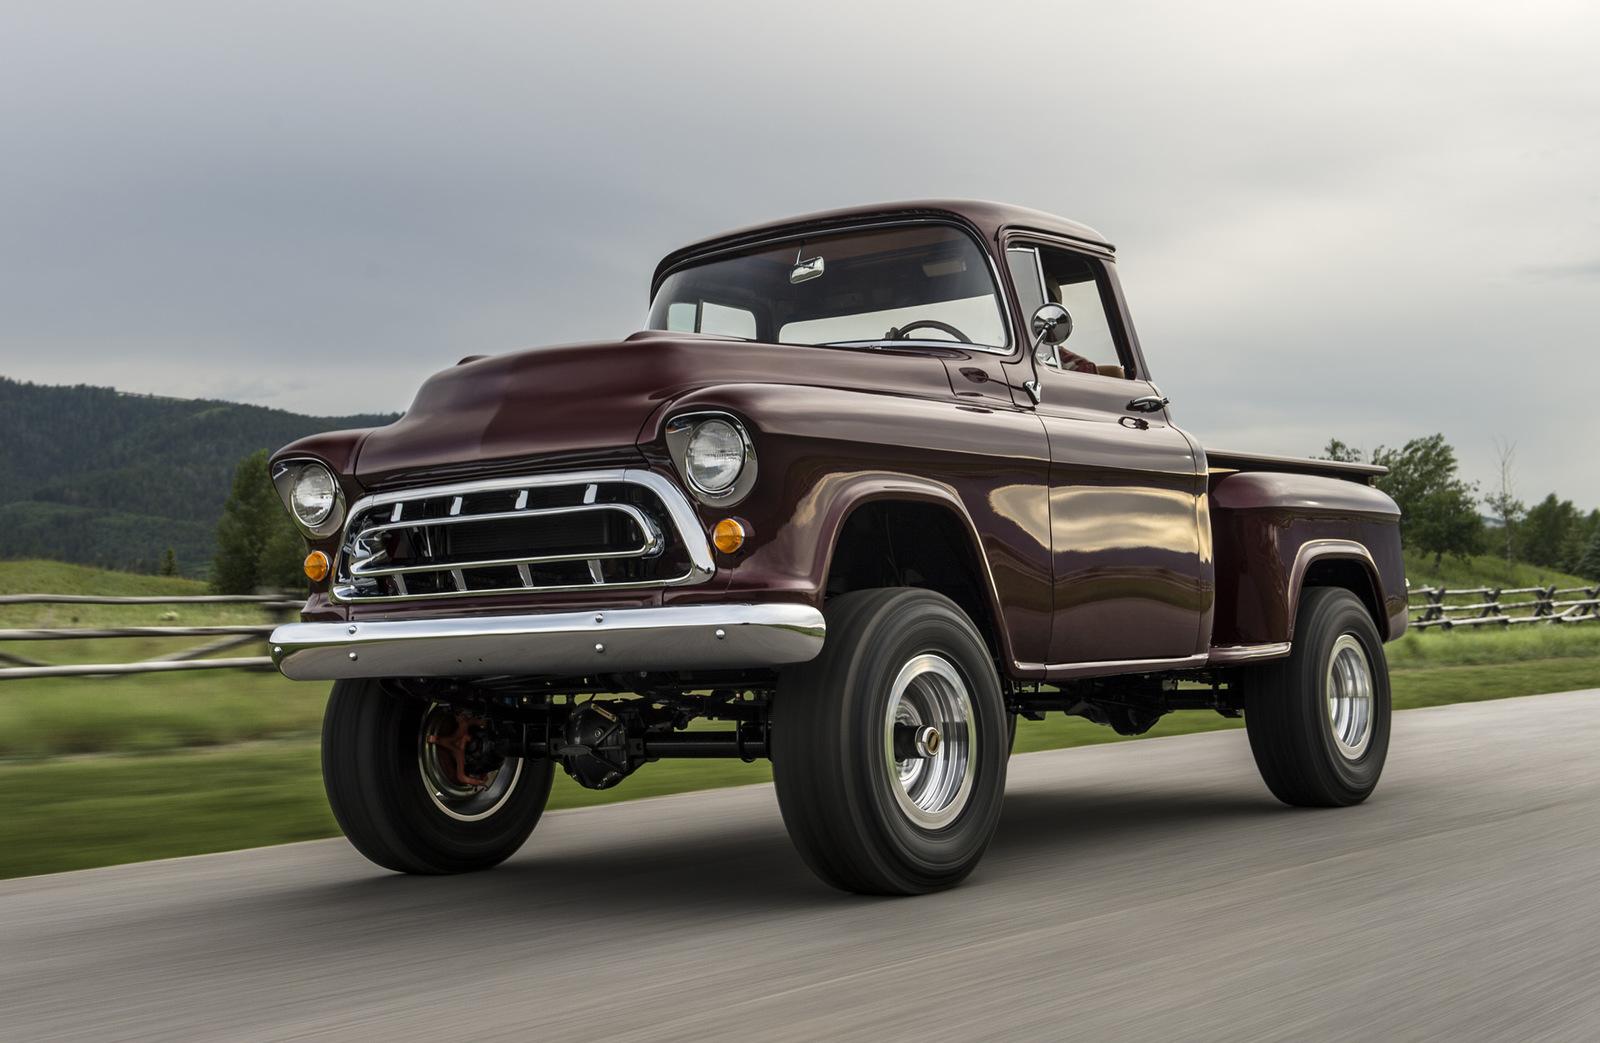 1950s-chevy-napco-4x4-by-legacy-classic-trucks--image-via-drew-phillips_100564685_h.jpg